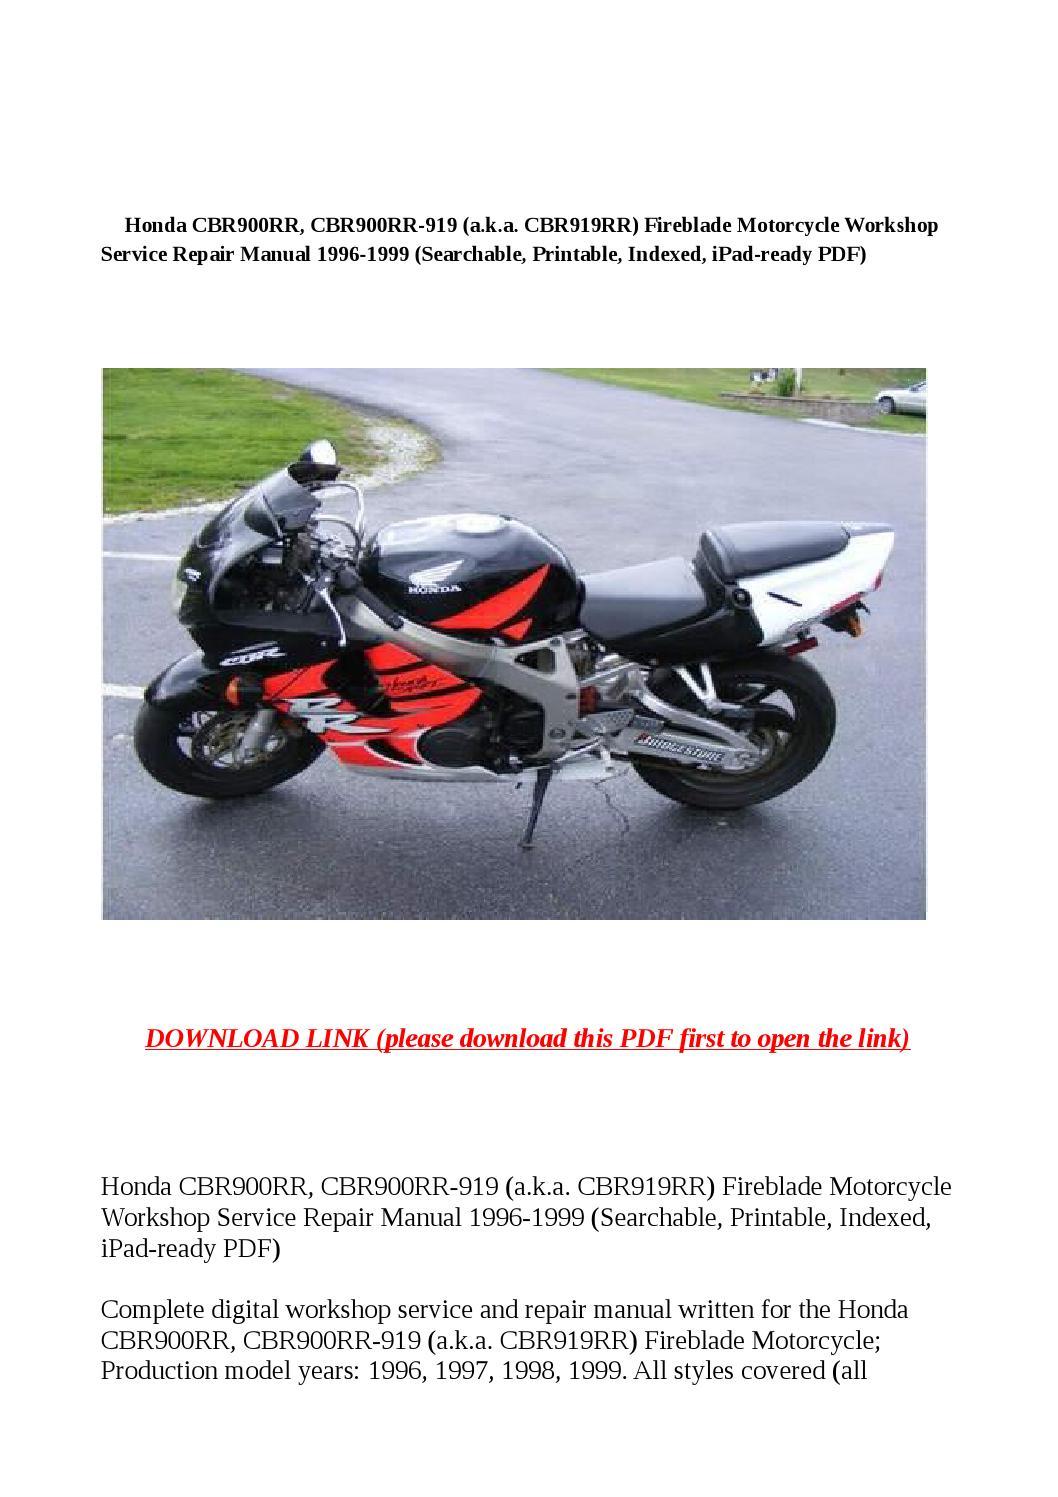 hight resolution of honda cbr900rr cbr900rr 919 a k a cbr919rr fireblade motorcycle workshop service repair manual 19